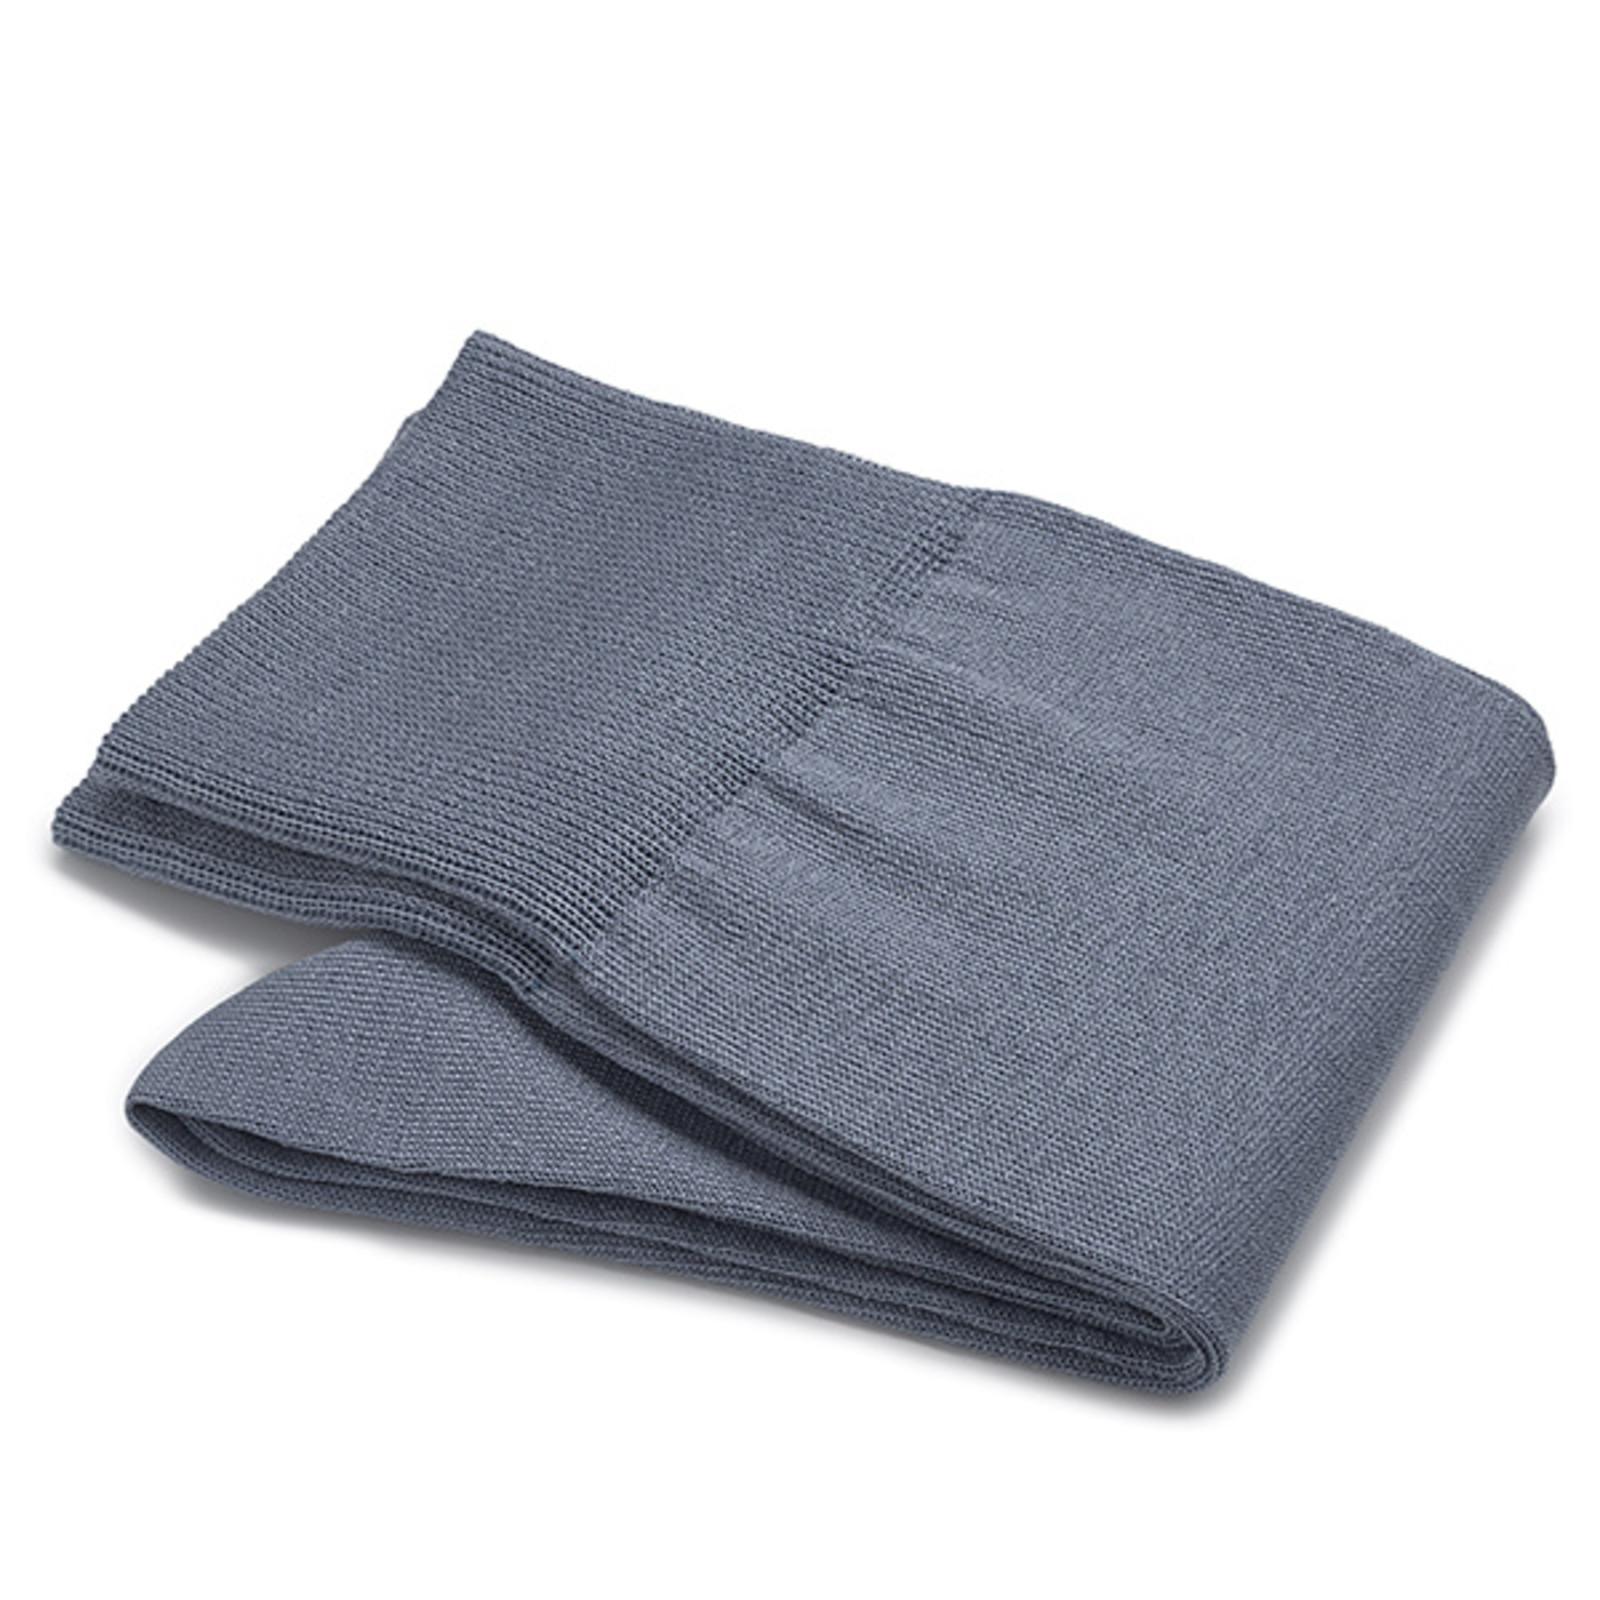 Carlo Lanza Blue grey socks cotton